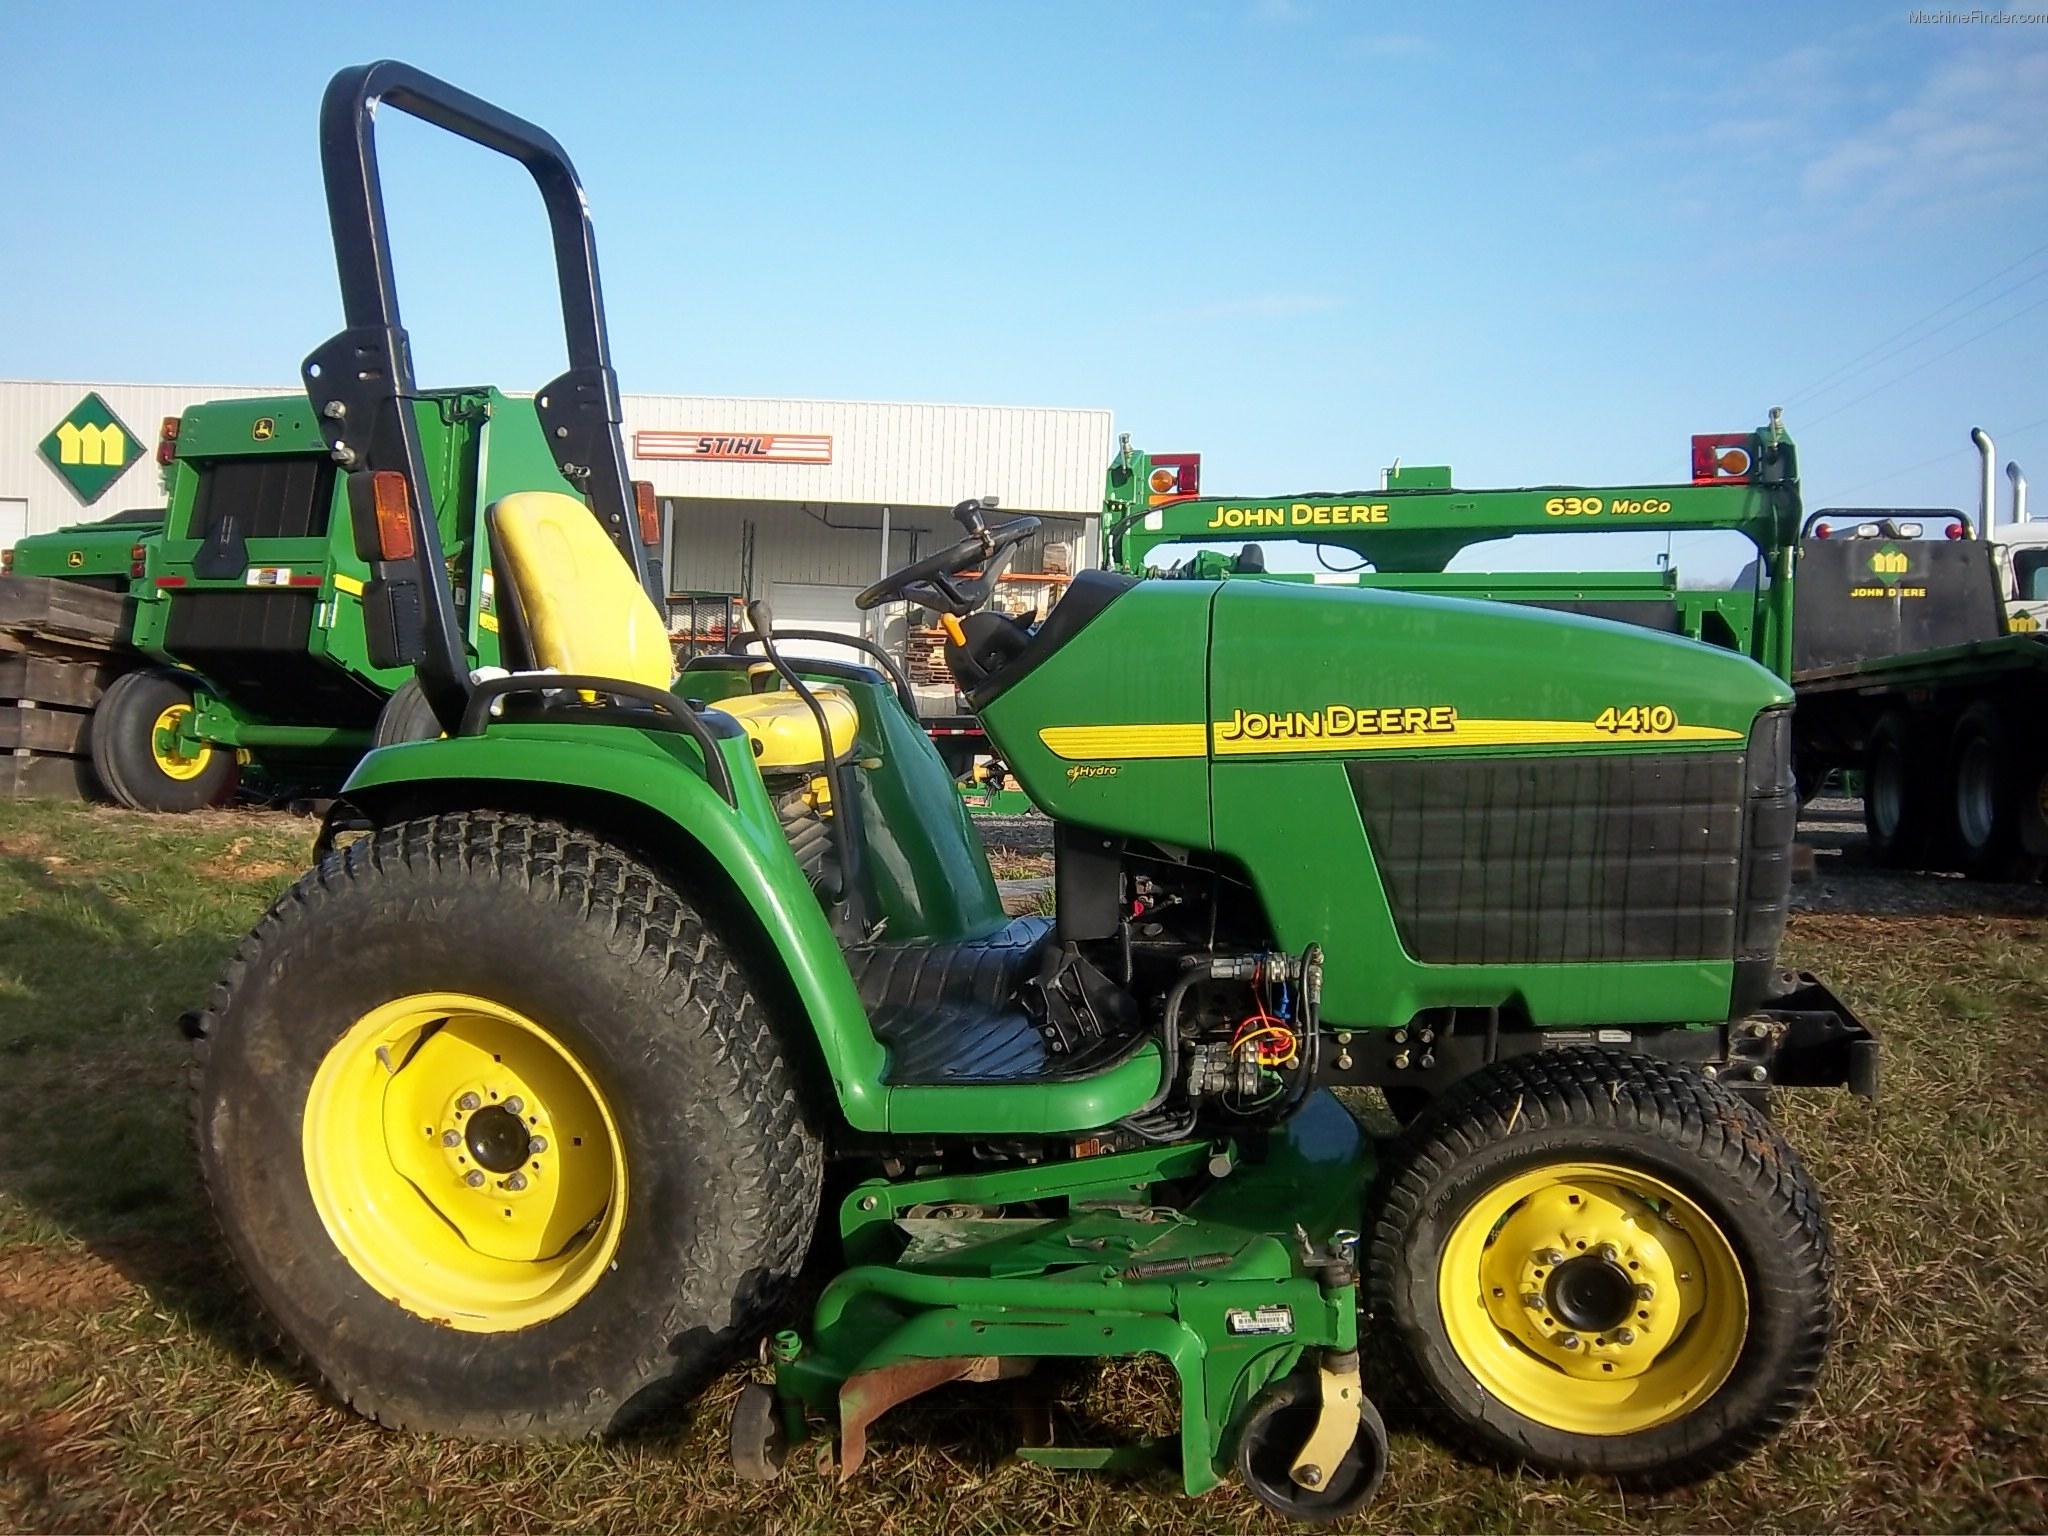 2003 John Deere 4410 Tractors - Compact (1-40hp.) - John ...